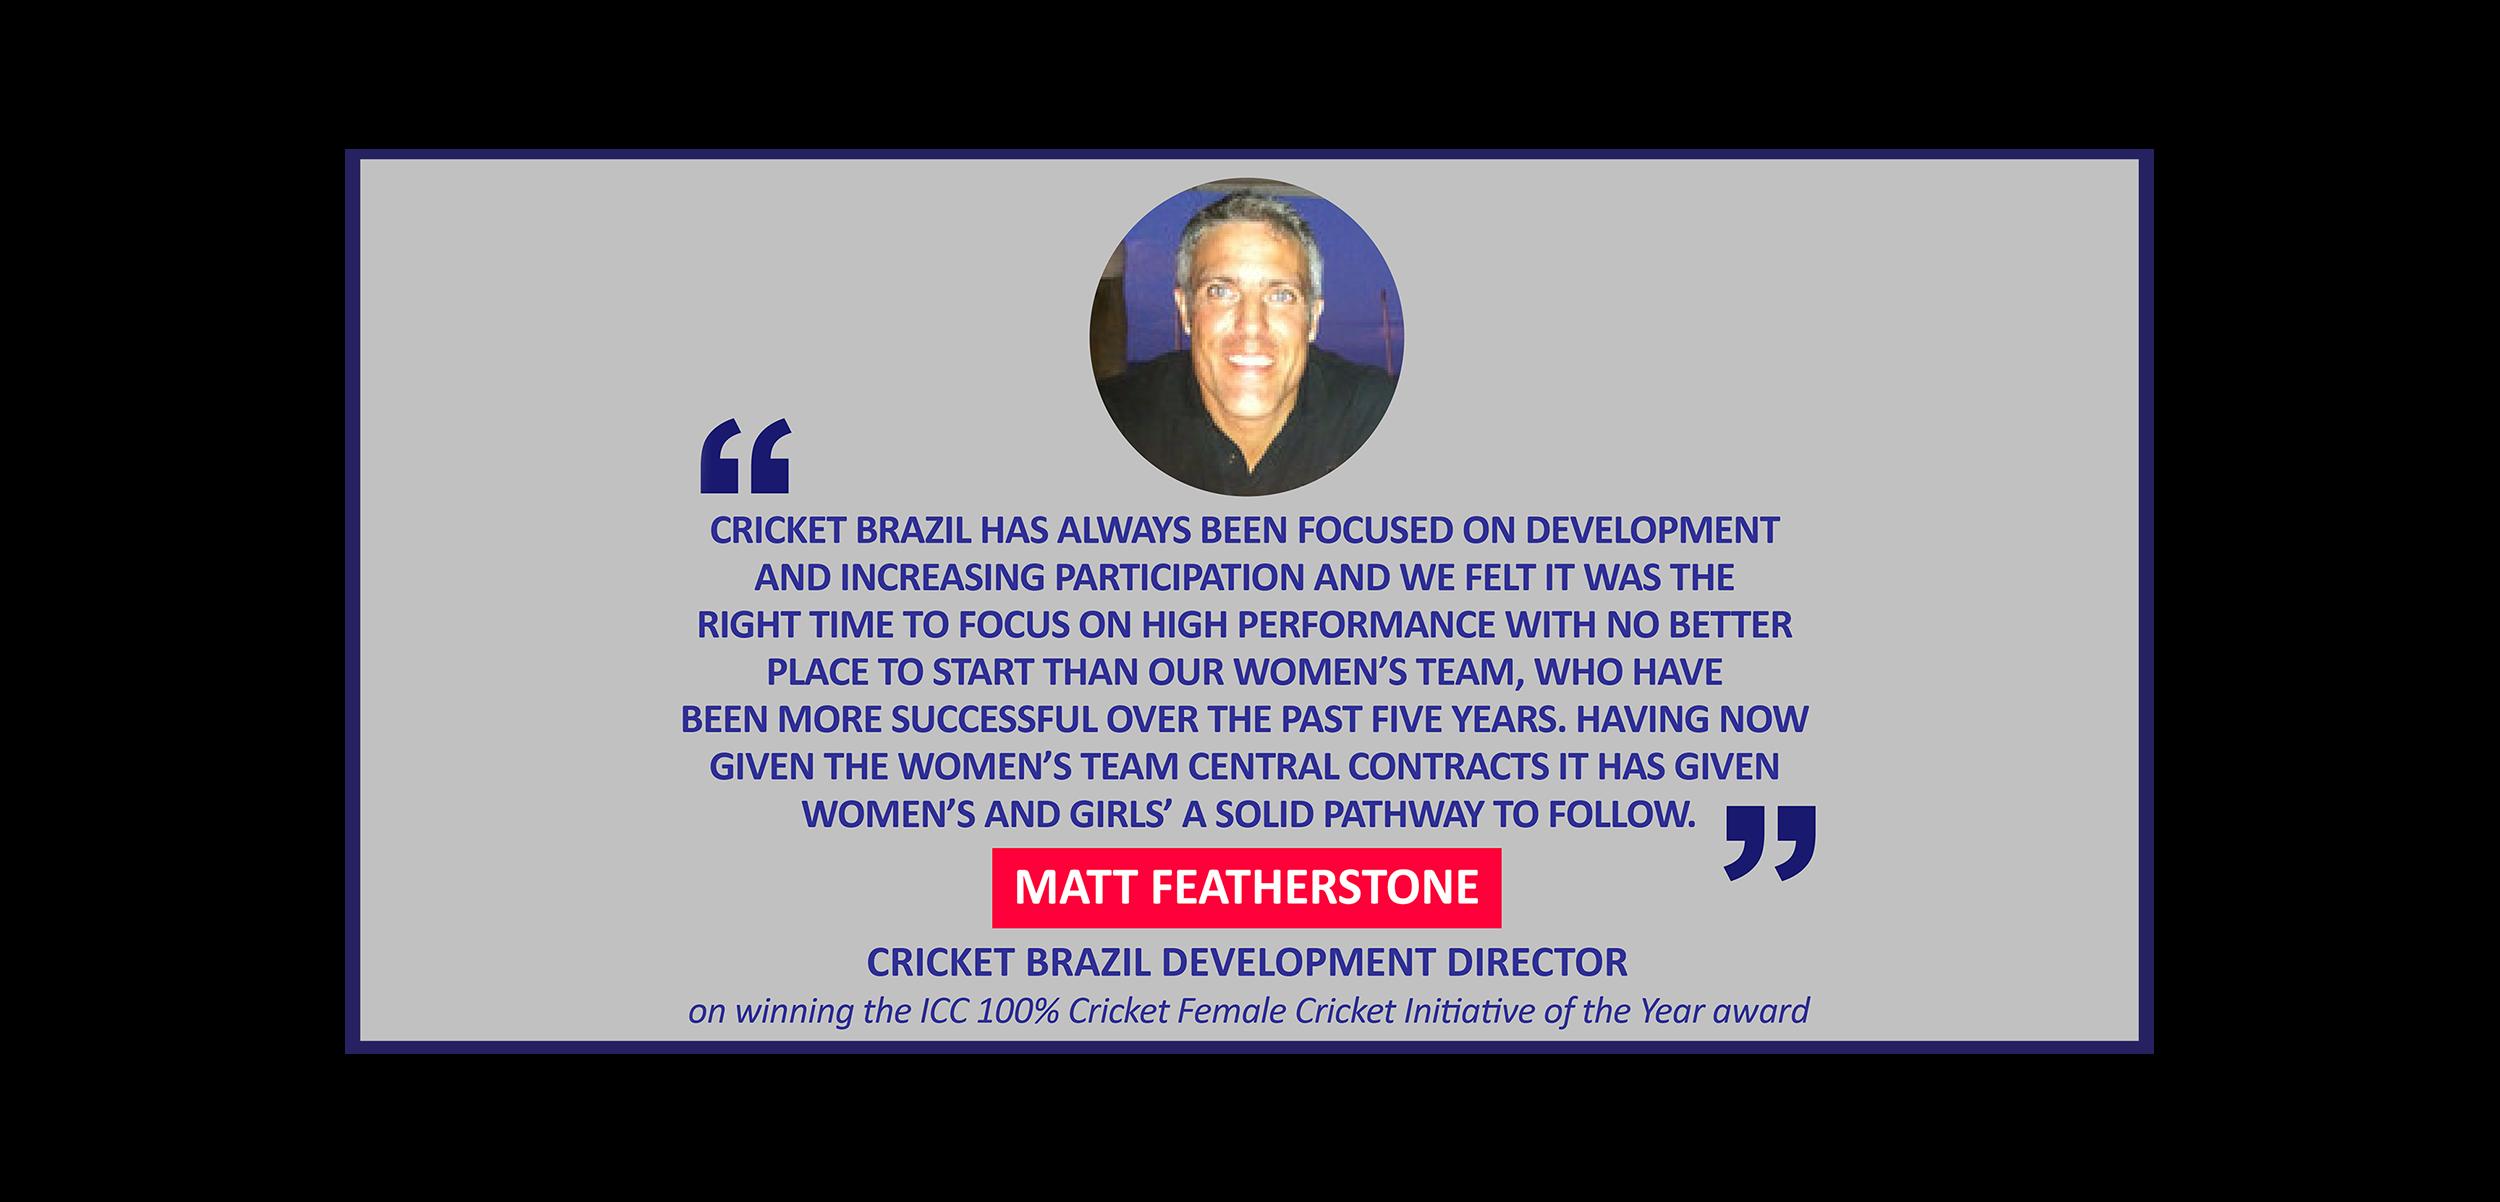 Matt Featherstone, Cricket Brazil Development Director on winning the ICC 100% Cricket Female Cricket Initiative of the Year award